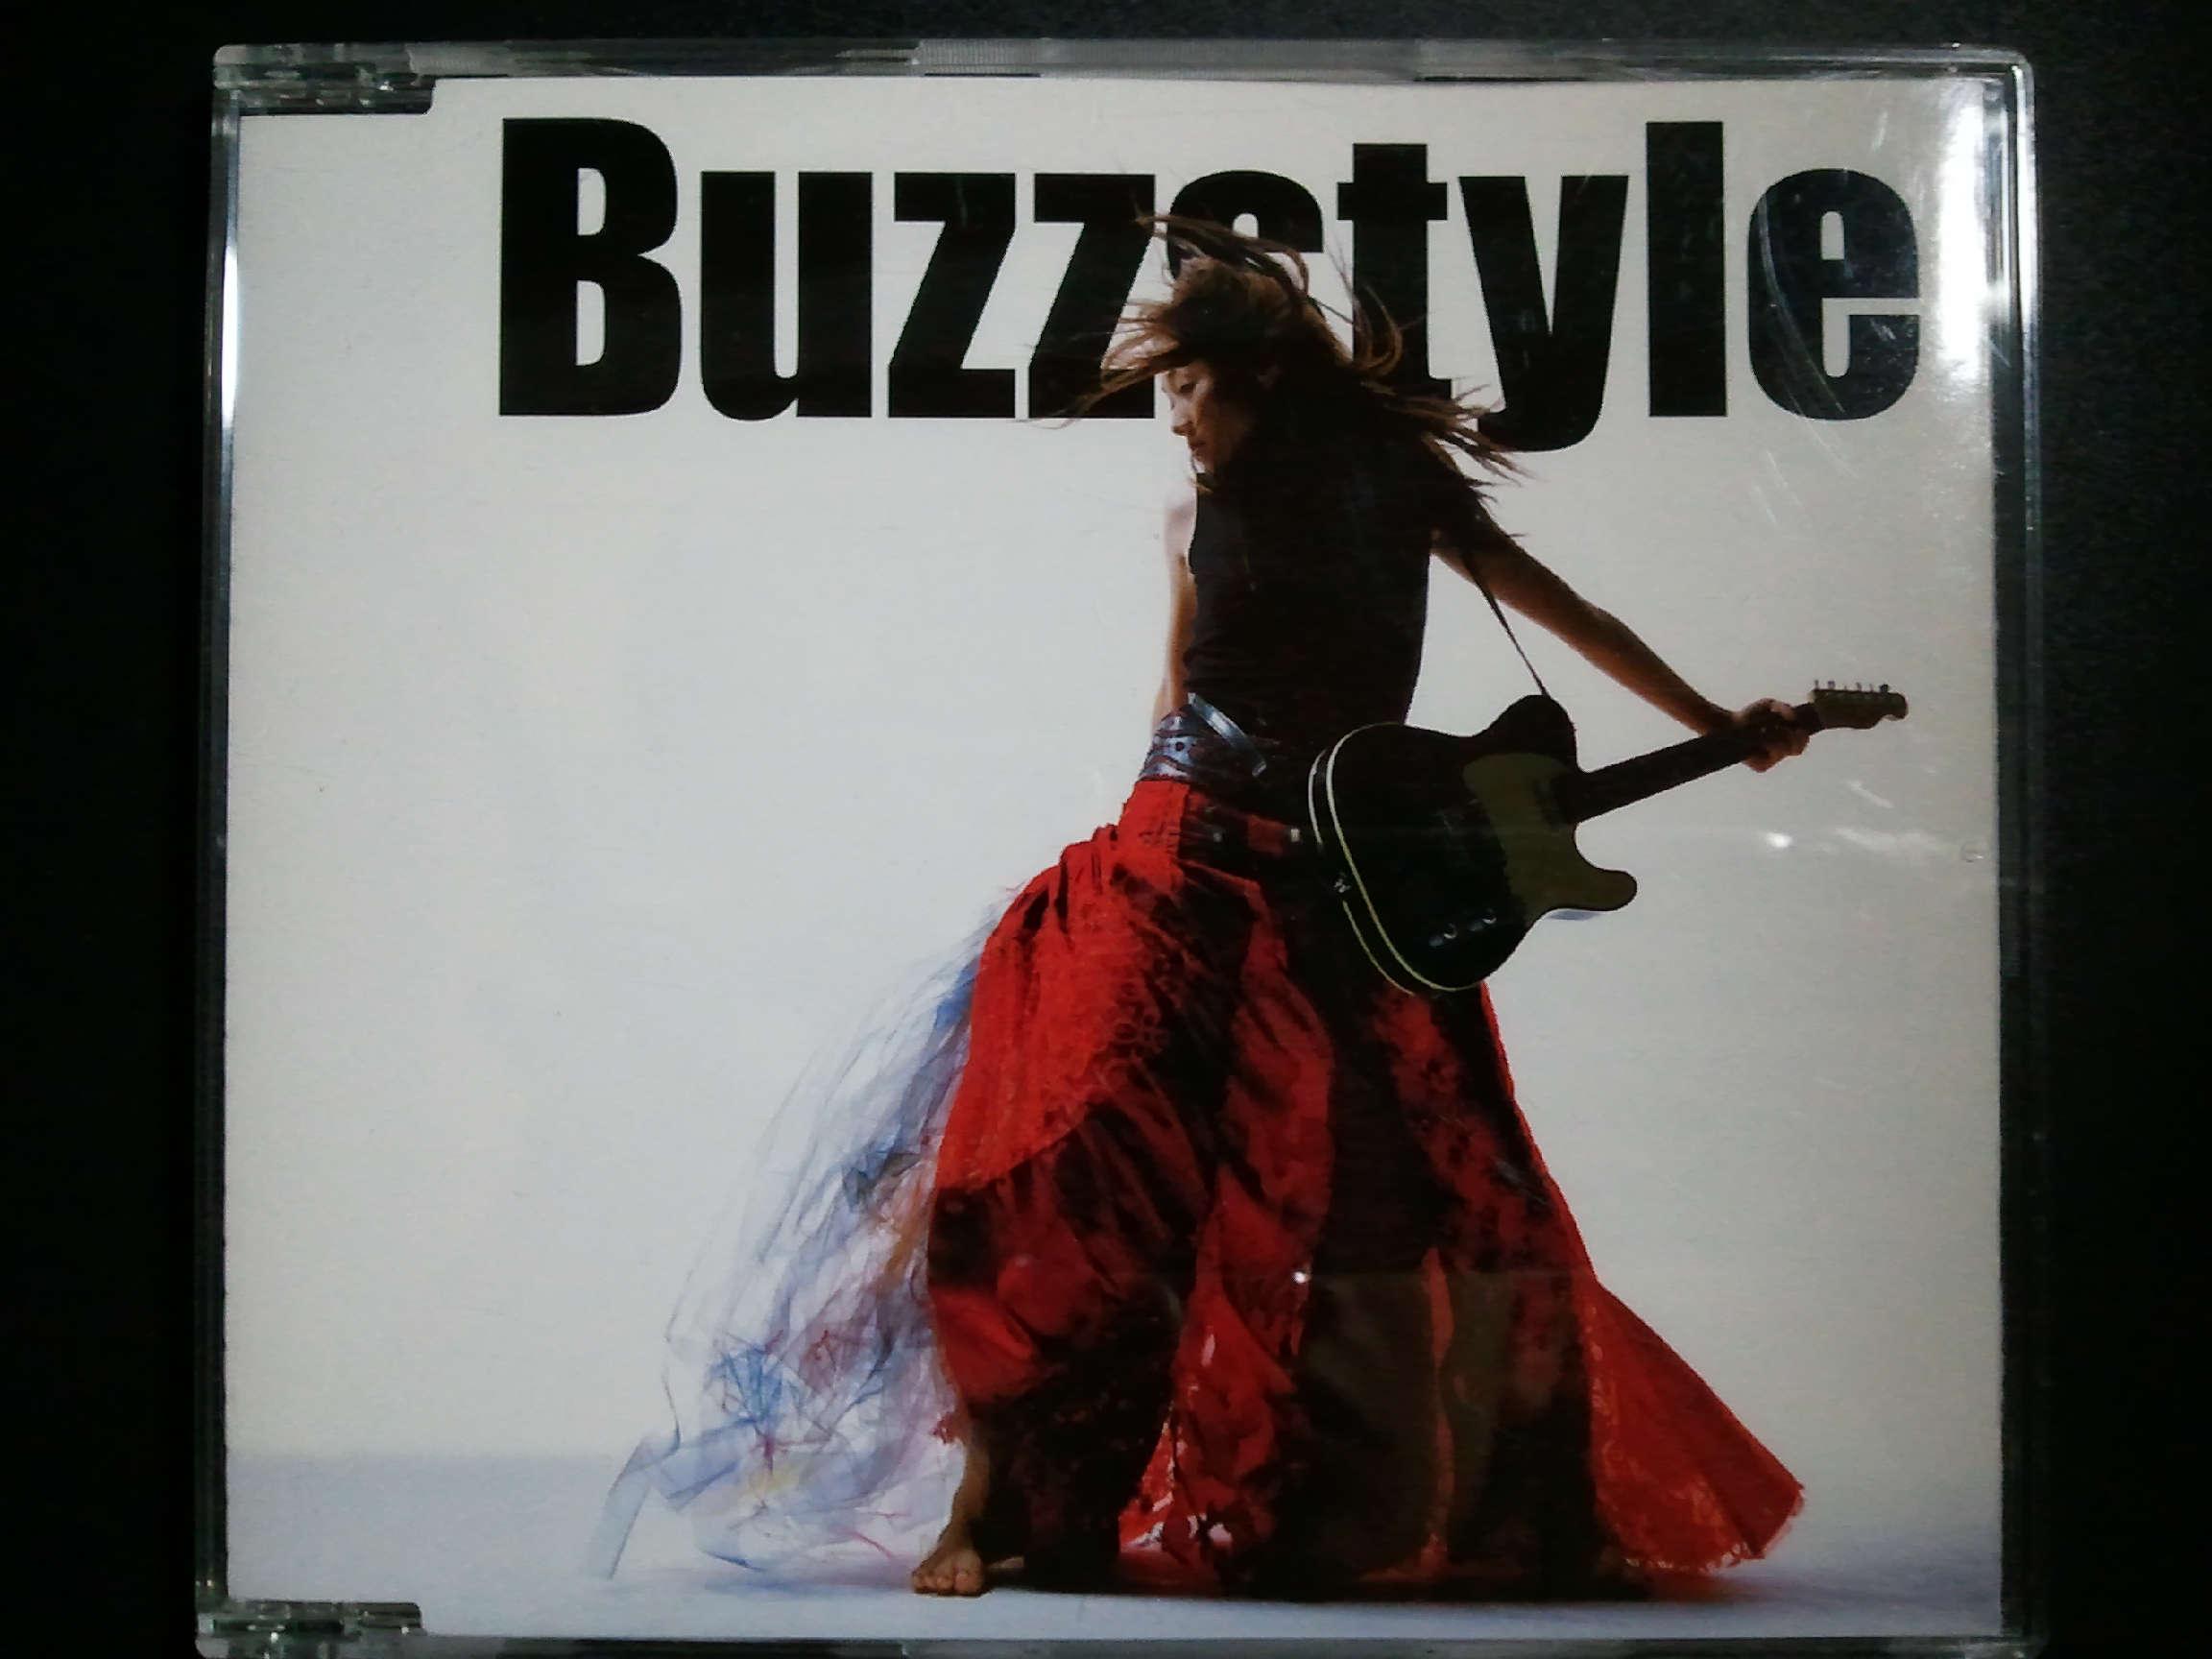 Buzzstyle